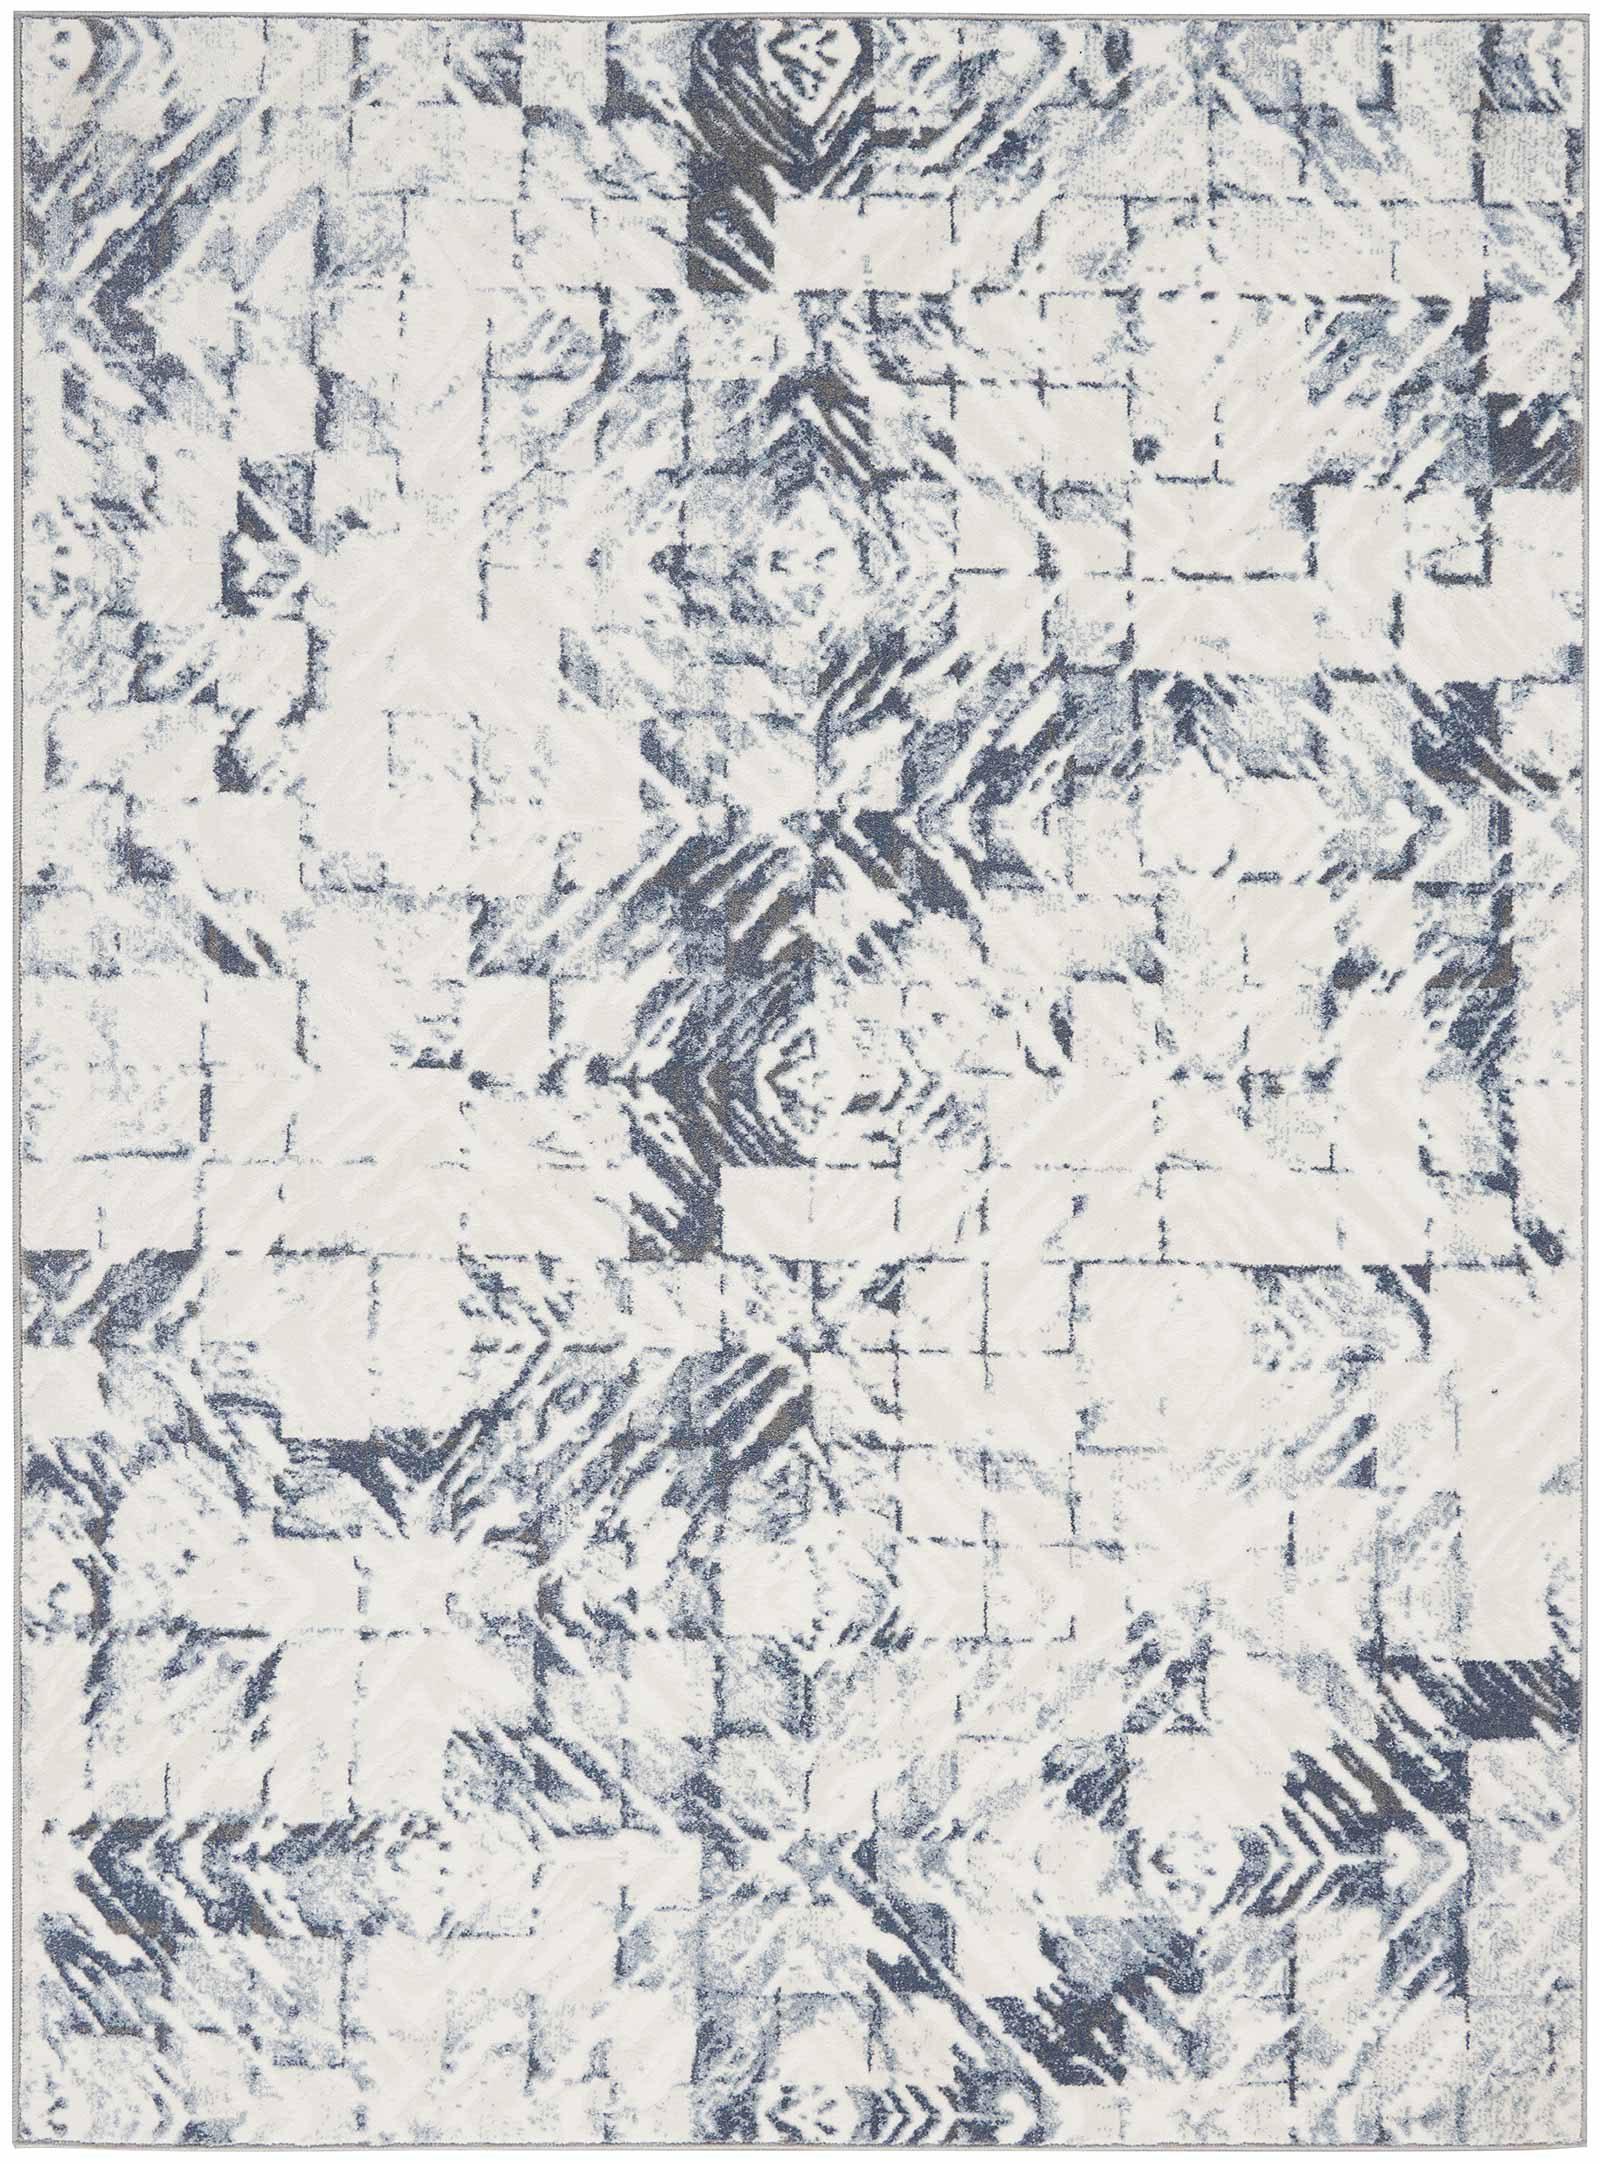 Nourison rug Urban Decor URD02 IVORY BLUE 5x7 099446466976 main